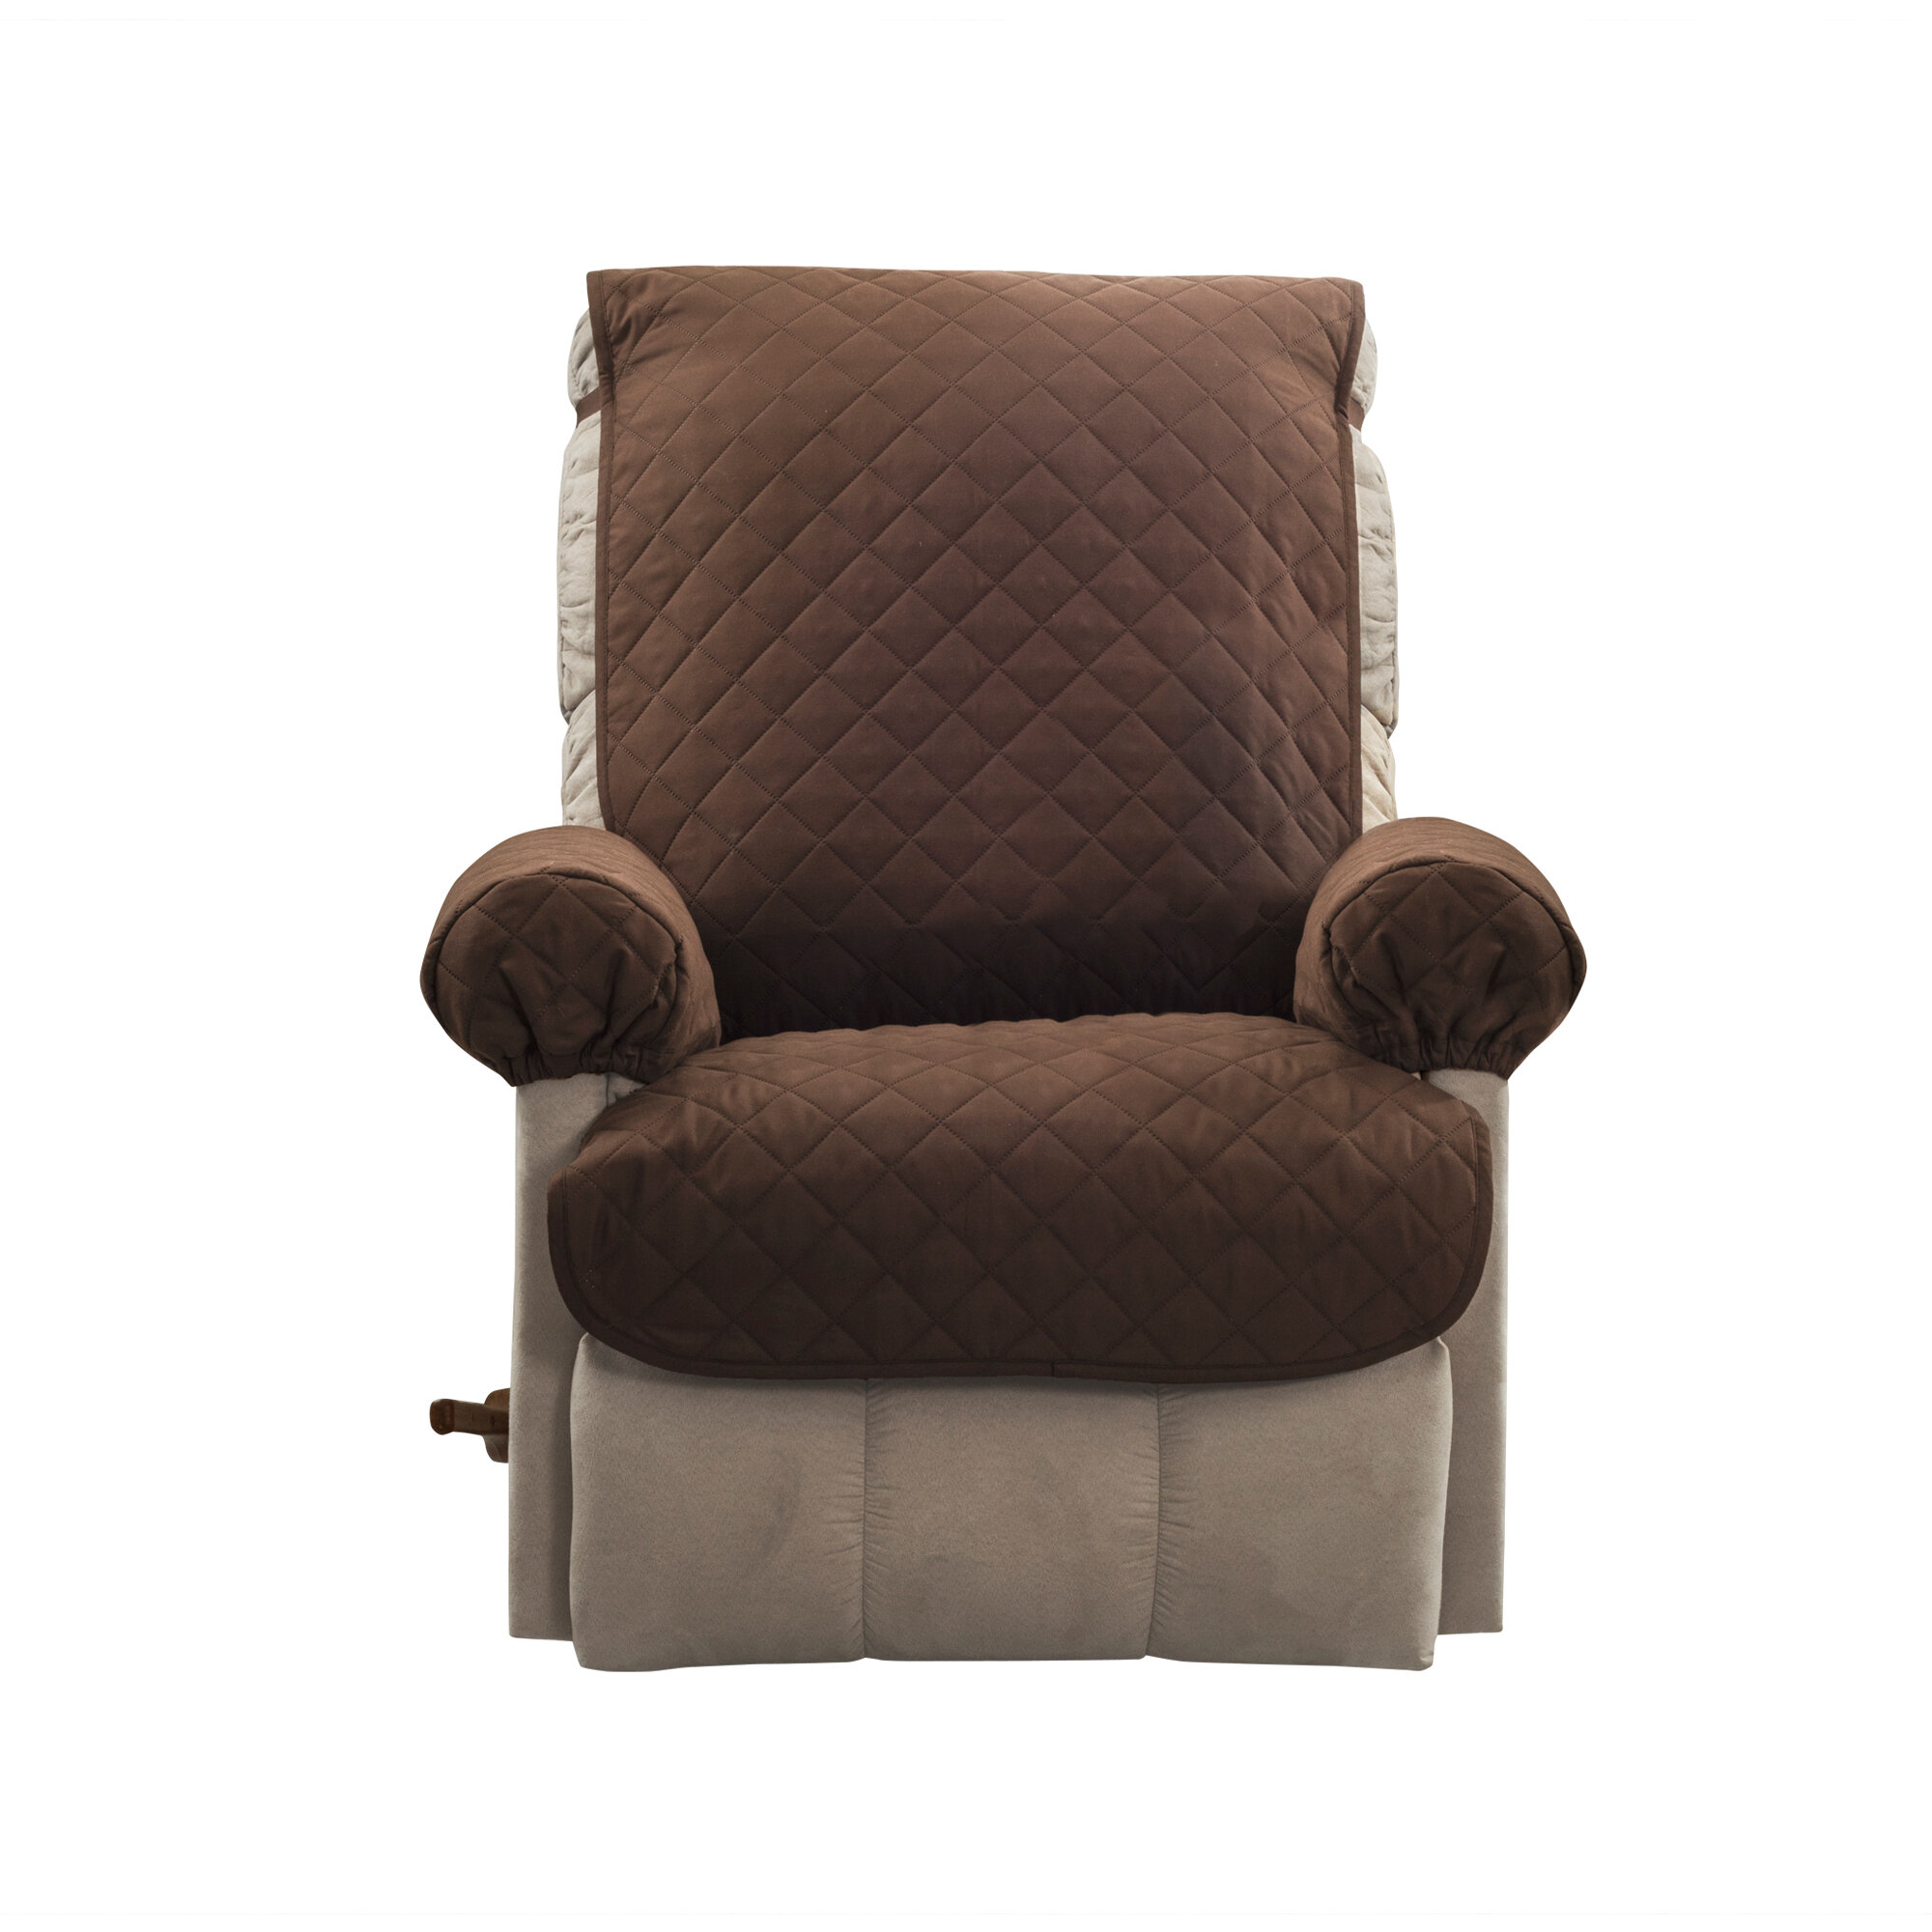 Rebrilliant Box Cushion Recliner Slipcover Reviews Wayfair